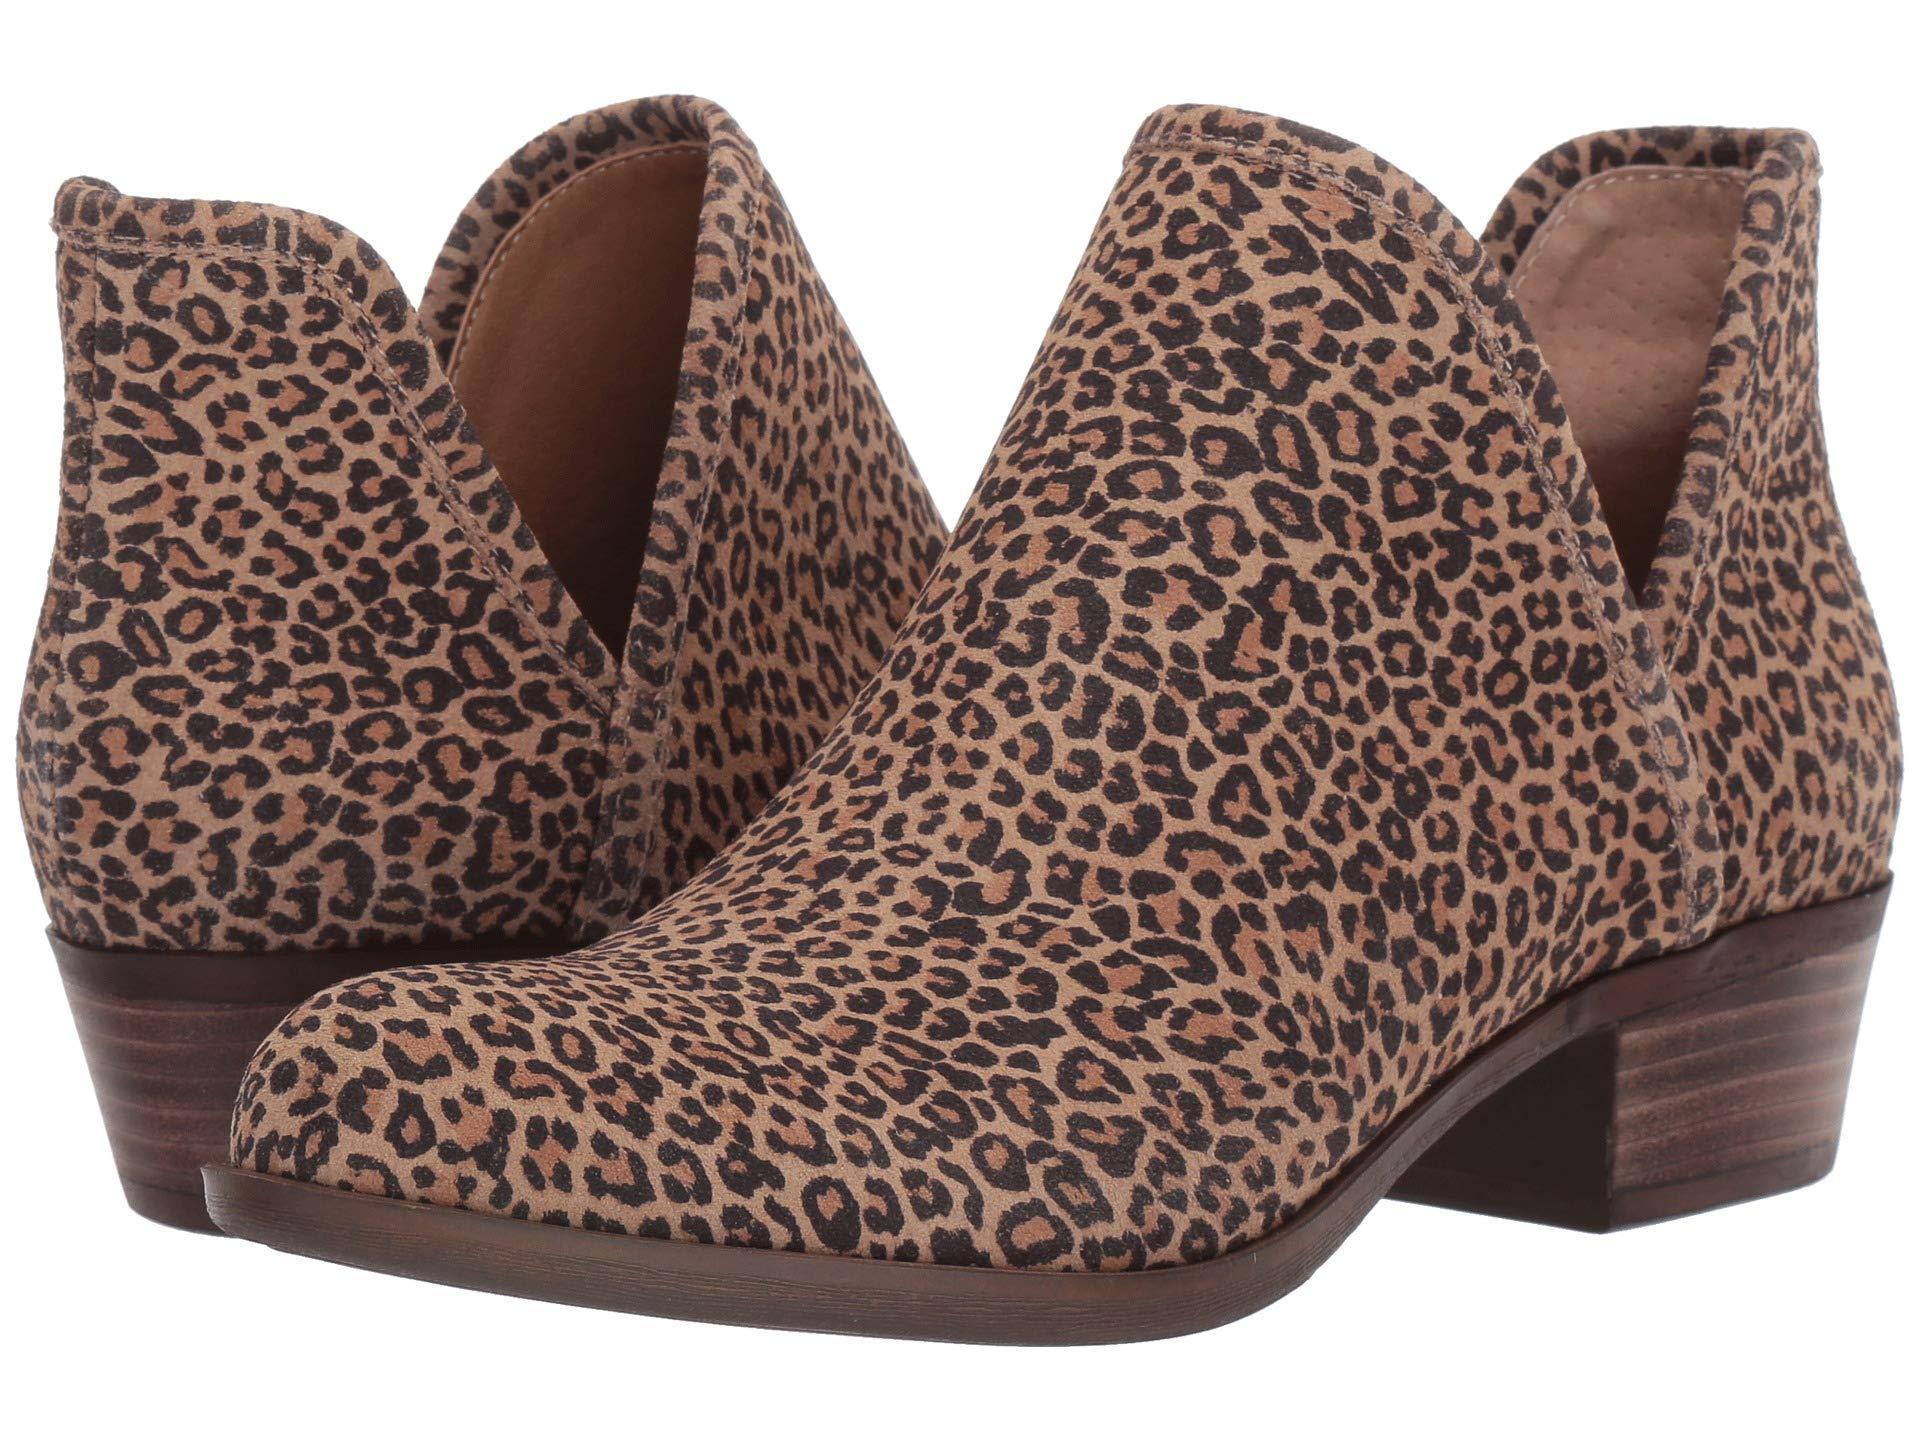 lucky brand leopard print booties